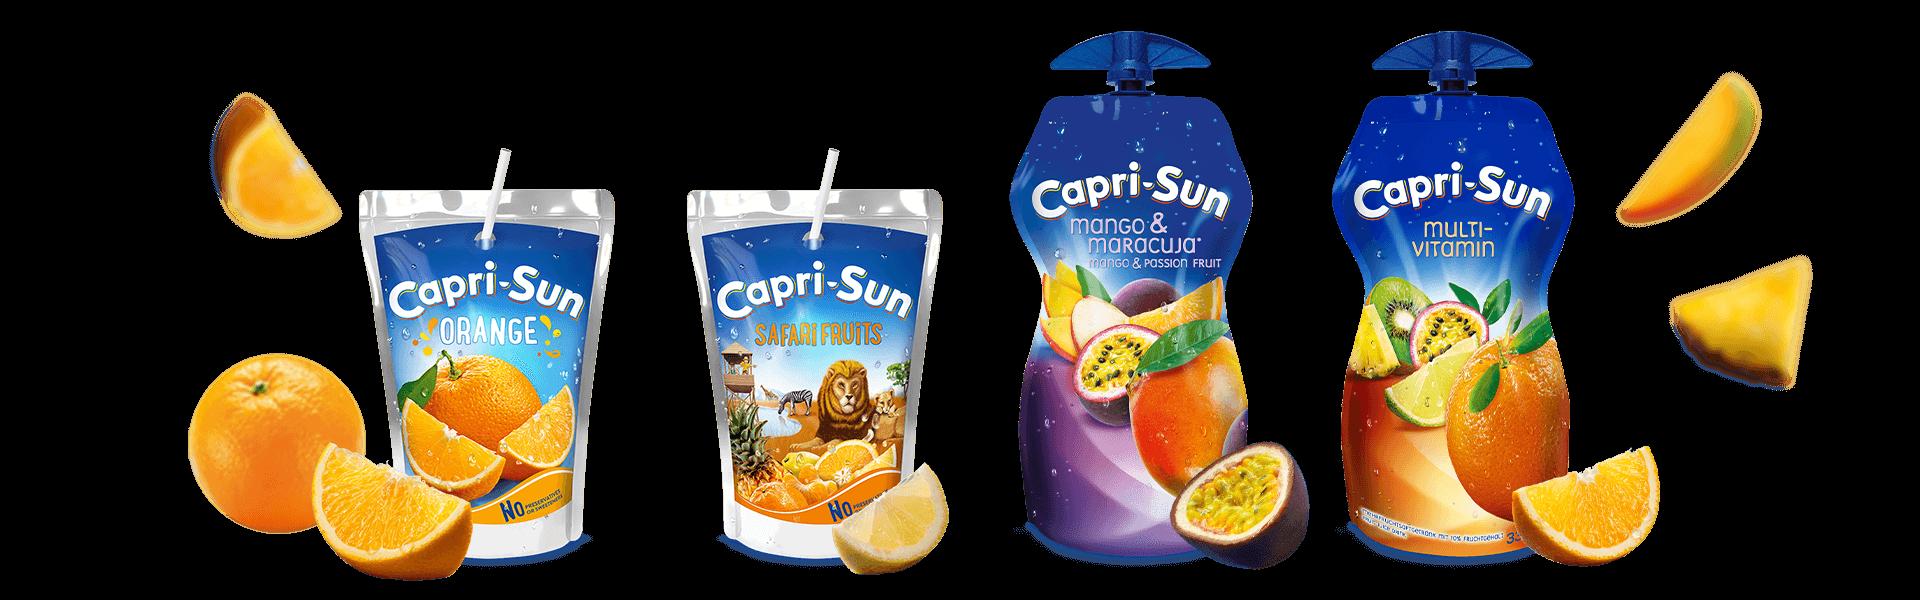 Capri-Sun_Orange_200ml_Safari-Fruits_200ml_Mango-Maracuja_330ml_and_Multivitamin_330ml_with-flying-fruits_picture-1024x320_v2